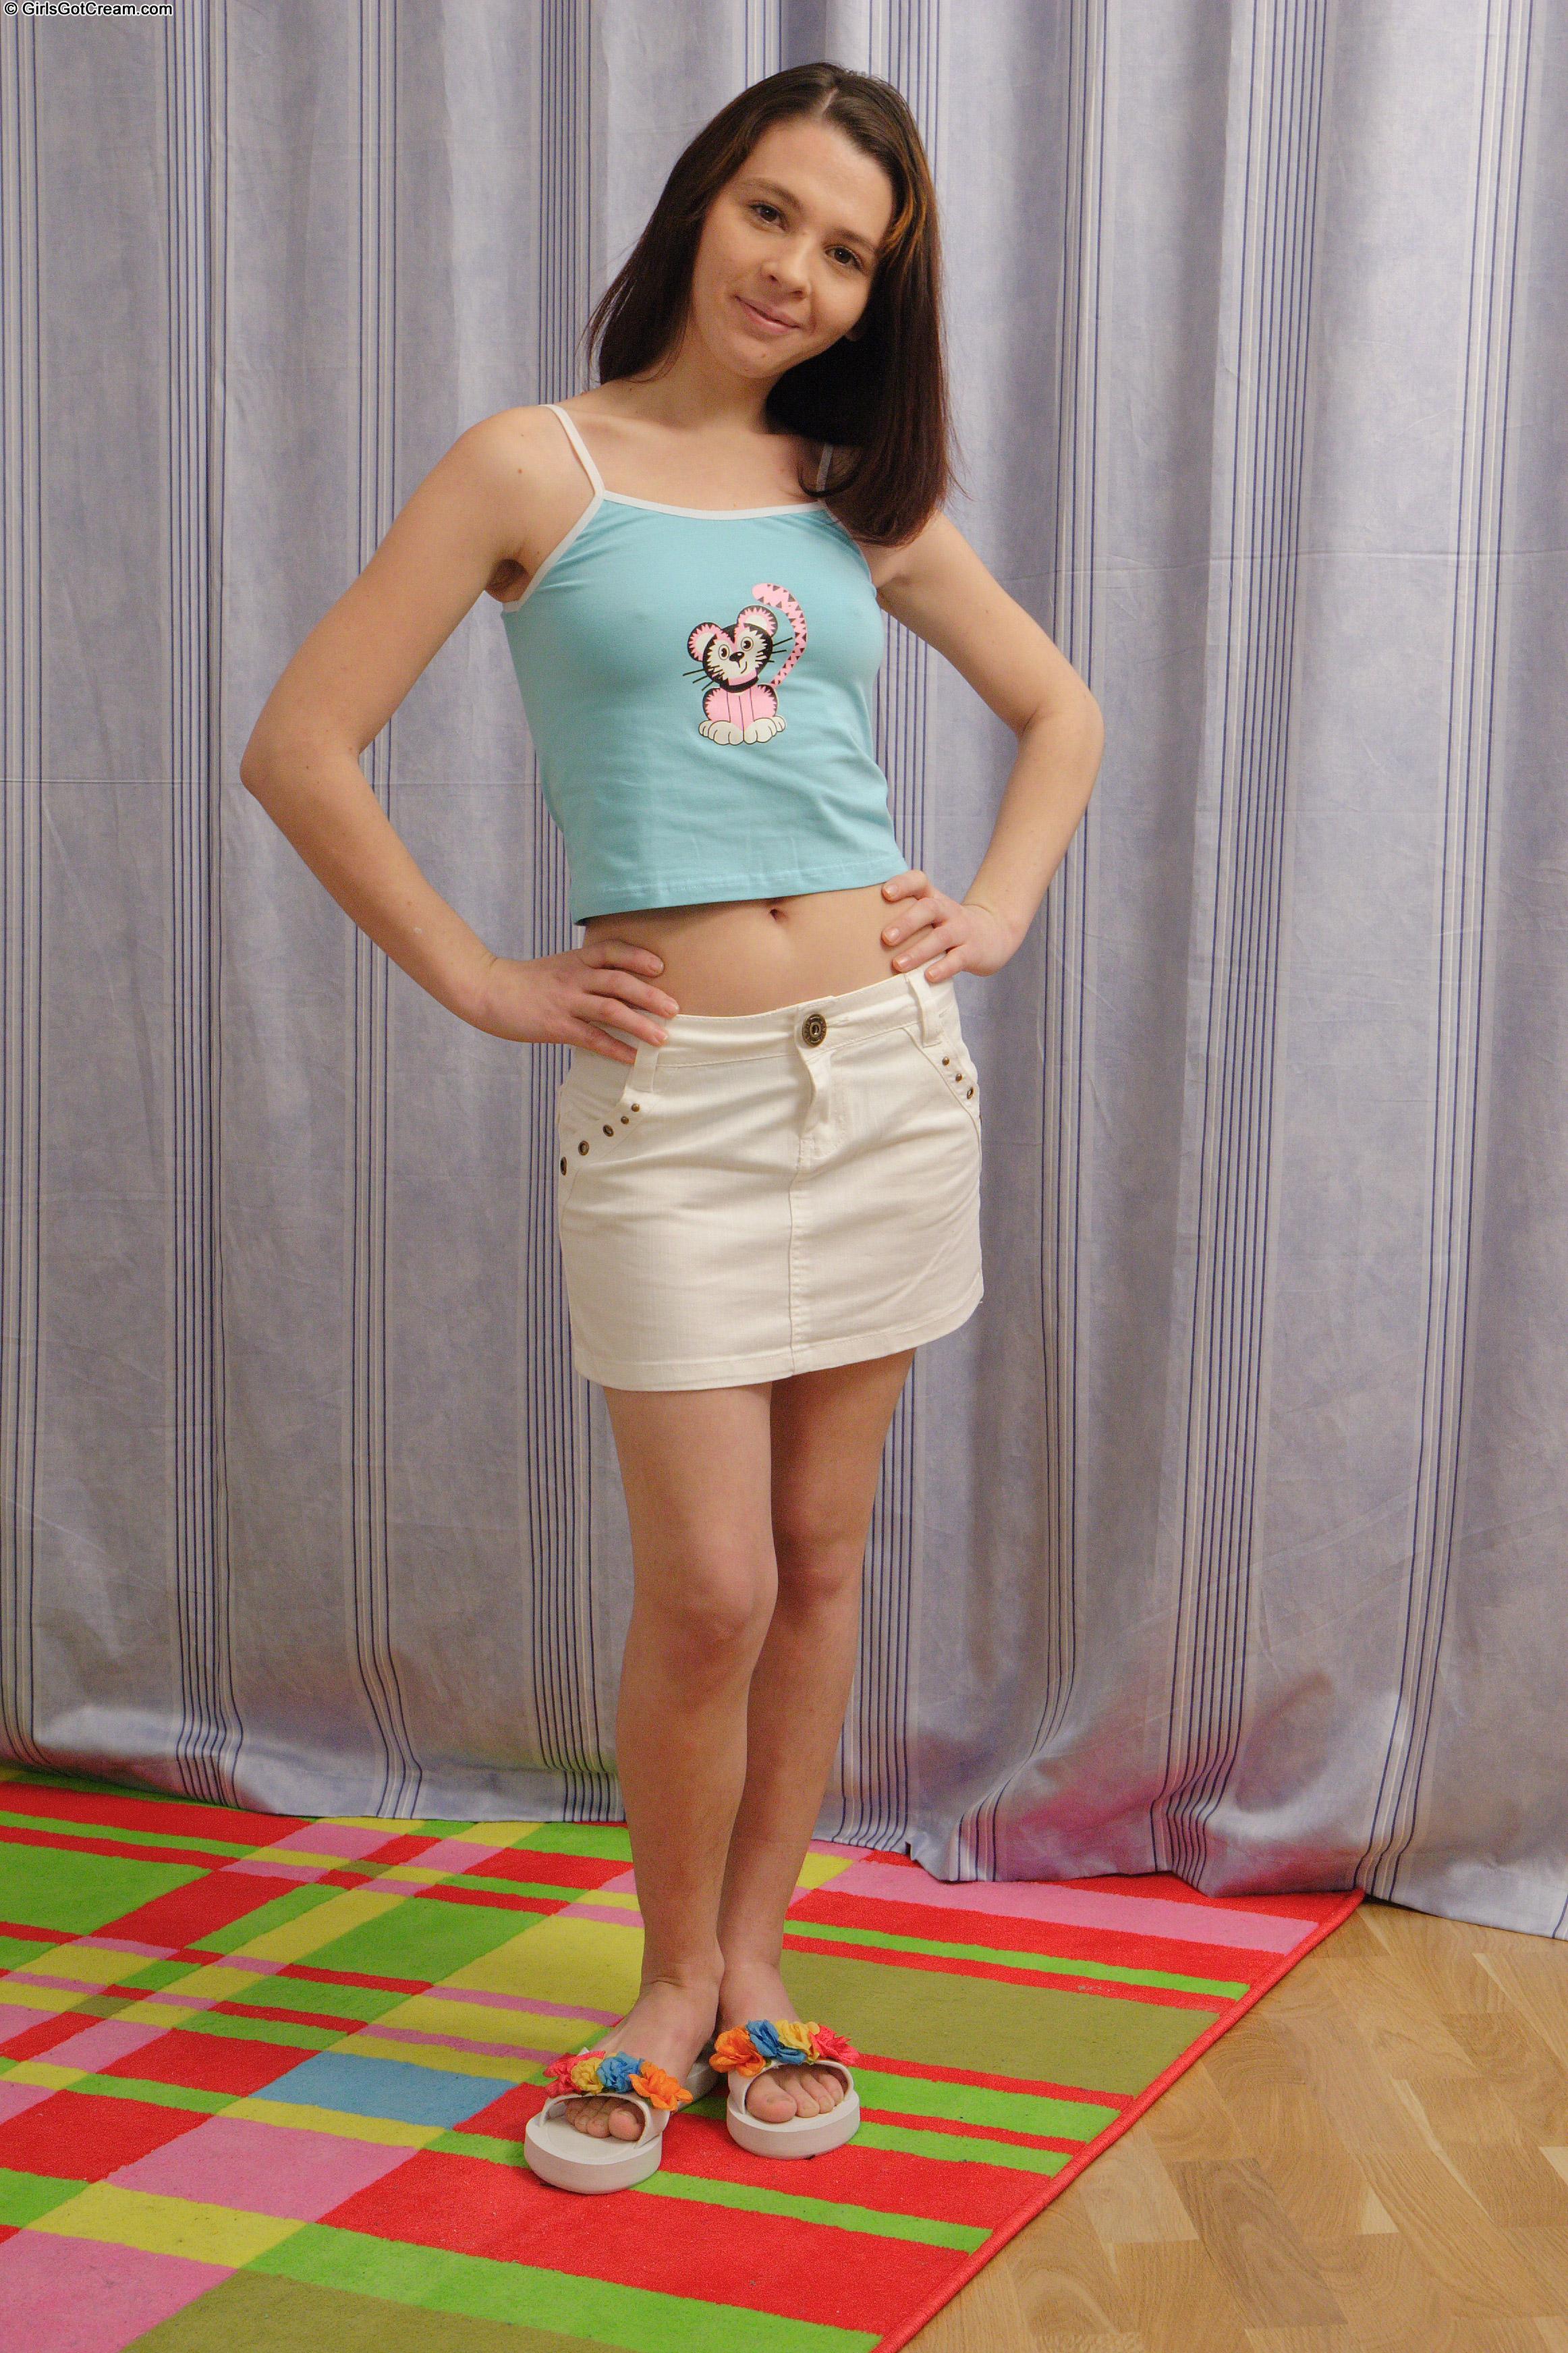 bangladeshi muslim porn star jasmine chowdhury